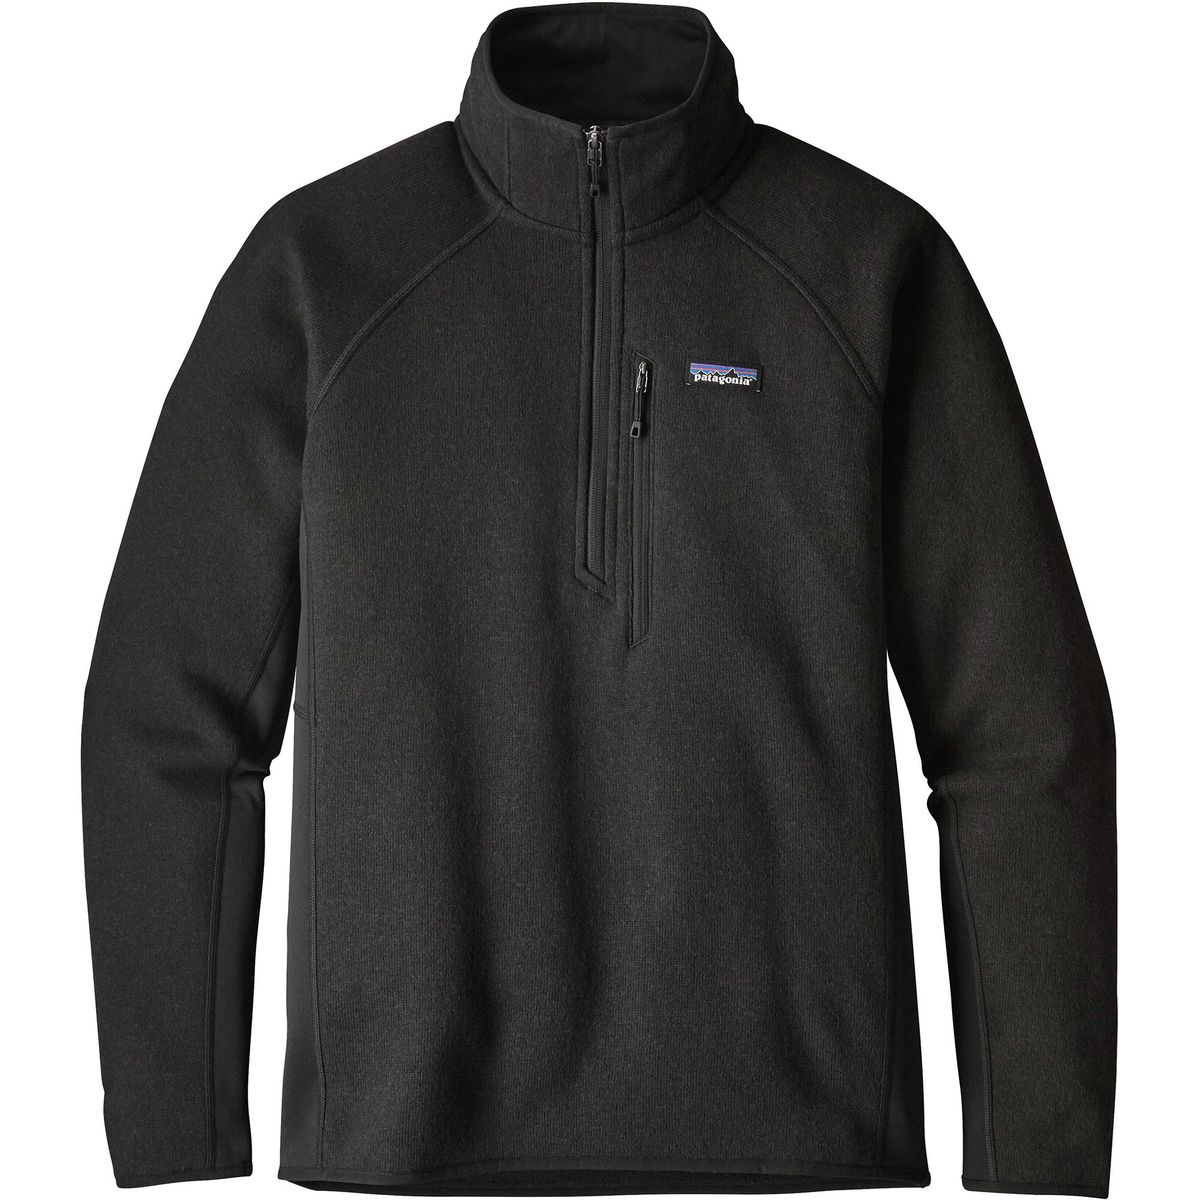 Patagonia Performance Better Sweater 1/4-Zip